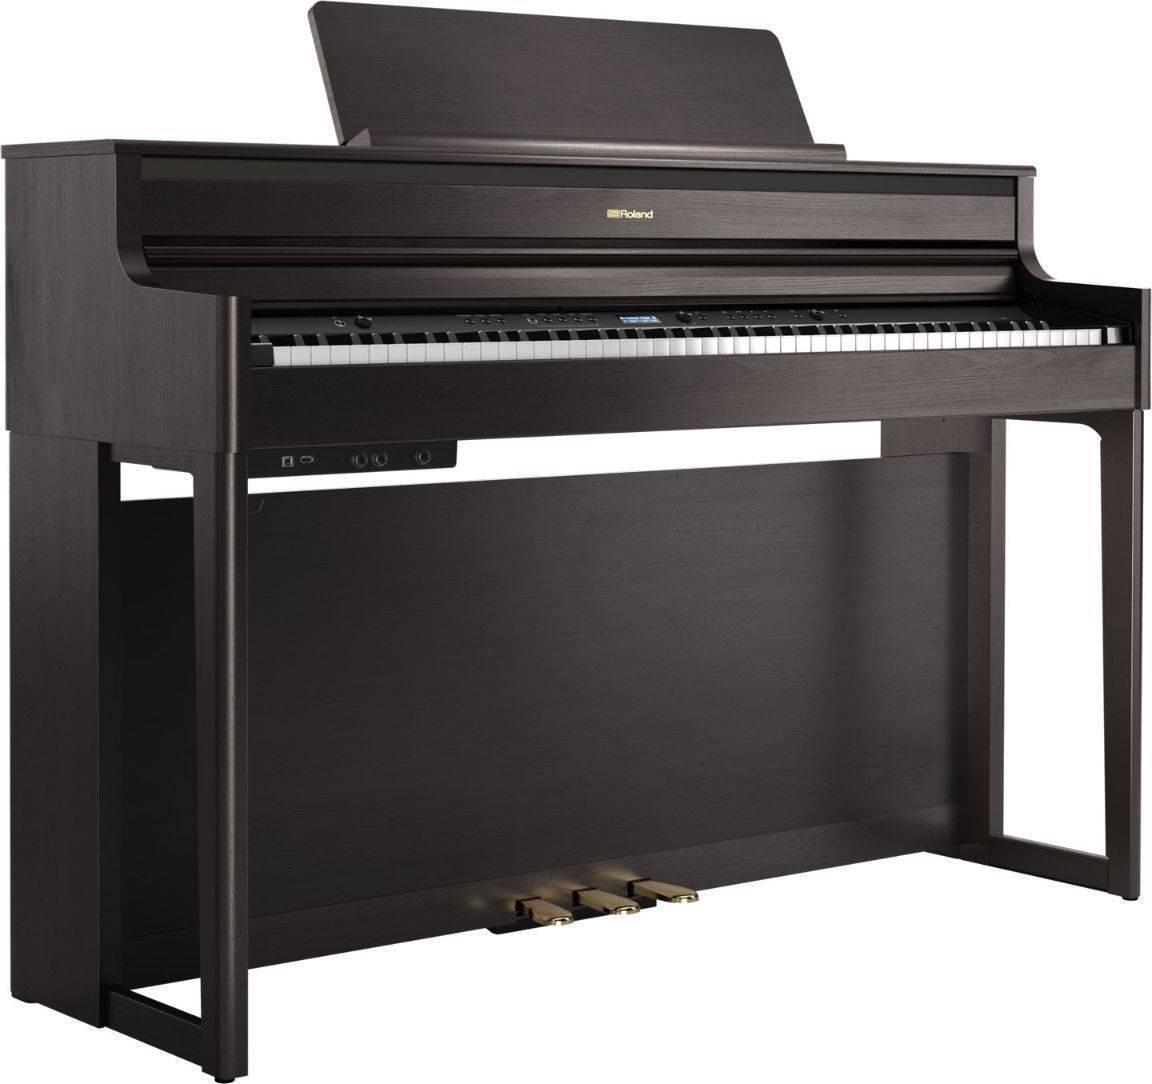 Piano Roland Profesional HP-704 Dark Rosewood